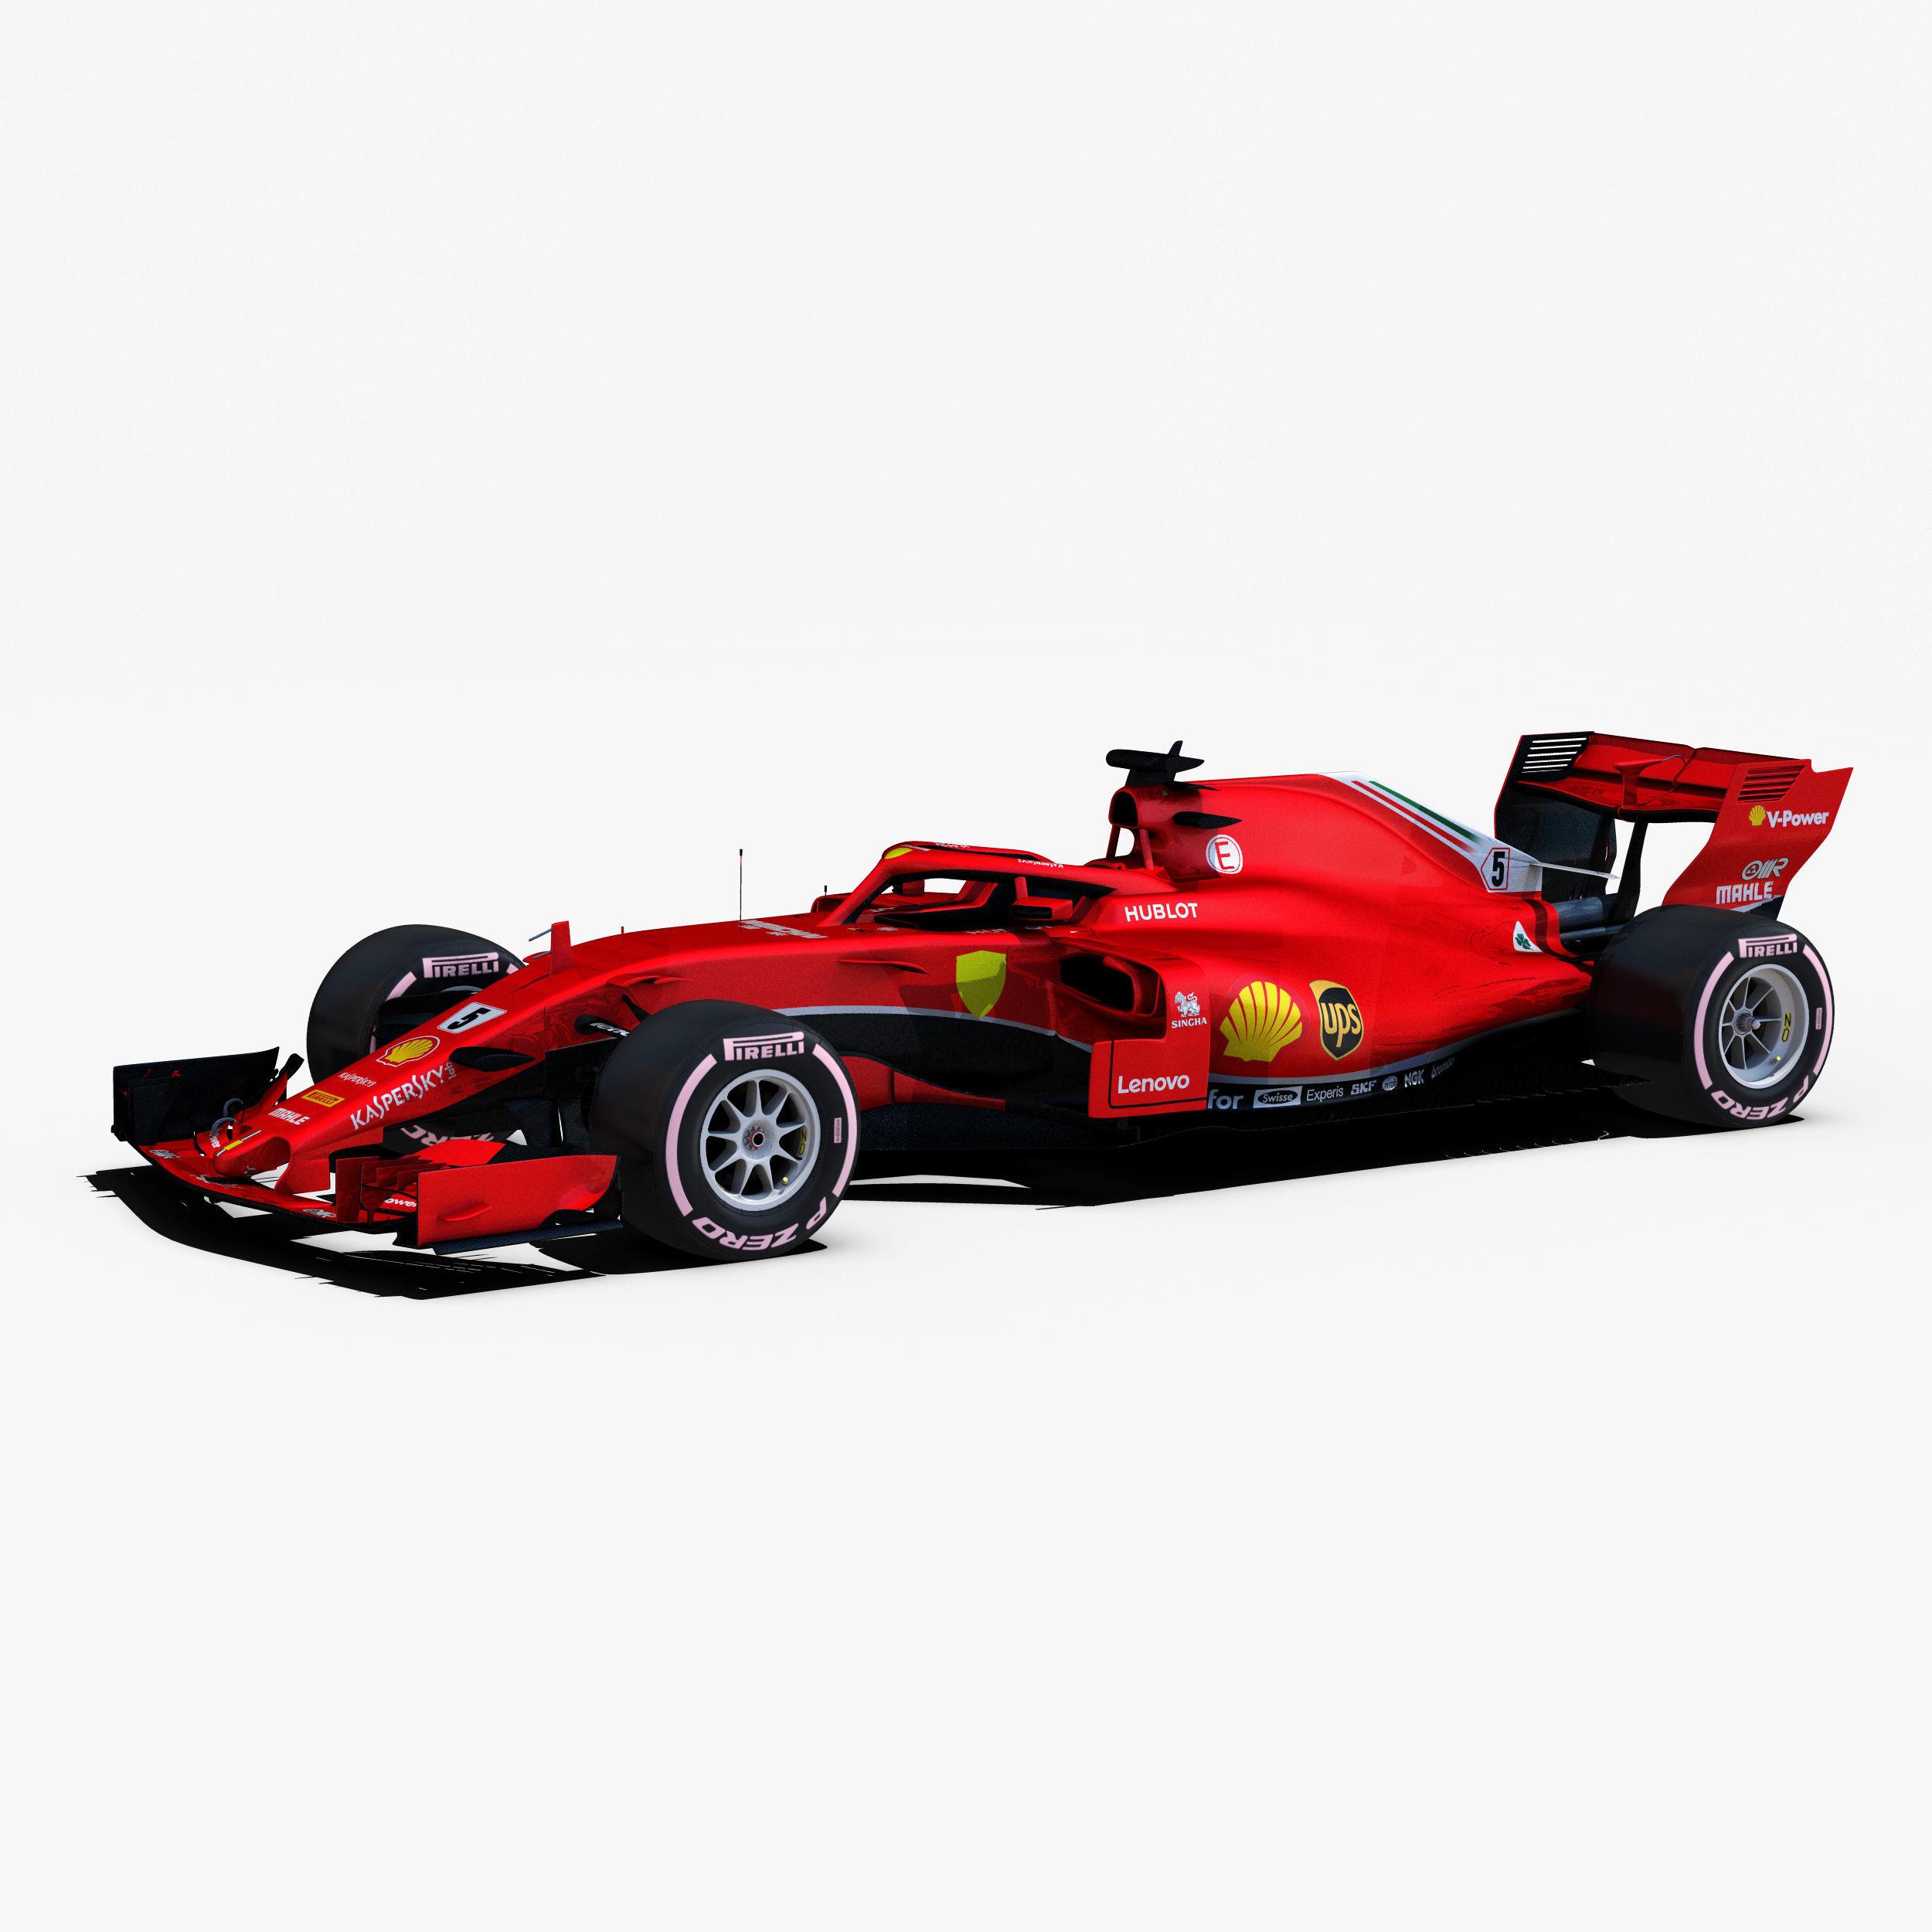 F1 2018 car